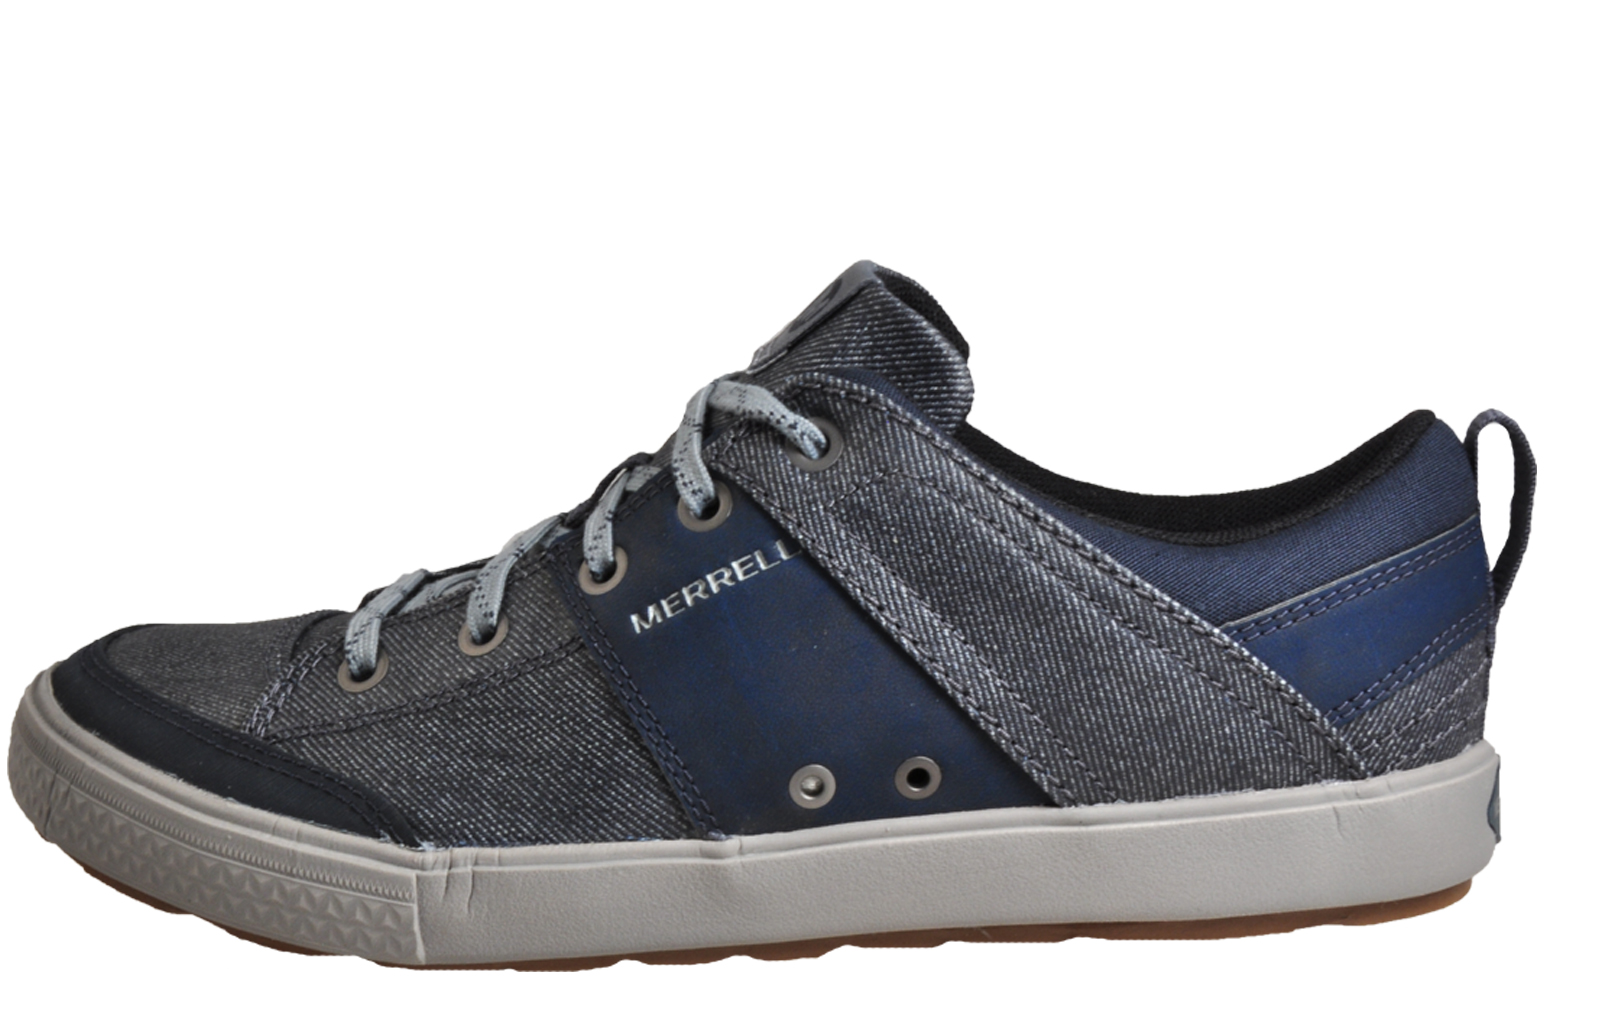 3dd47331ca3 Cheap Merrell Mens Hiking Boots & Walking Shoes | Merrell Shoes Sale